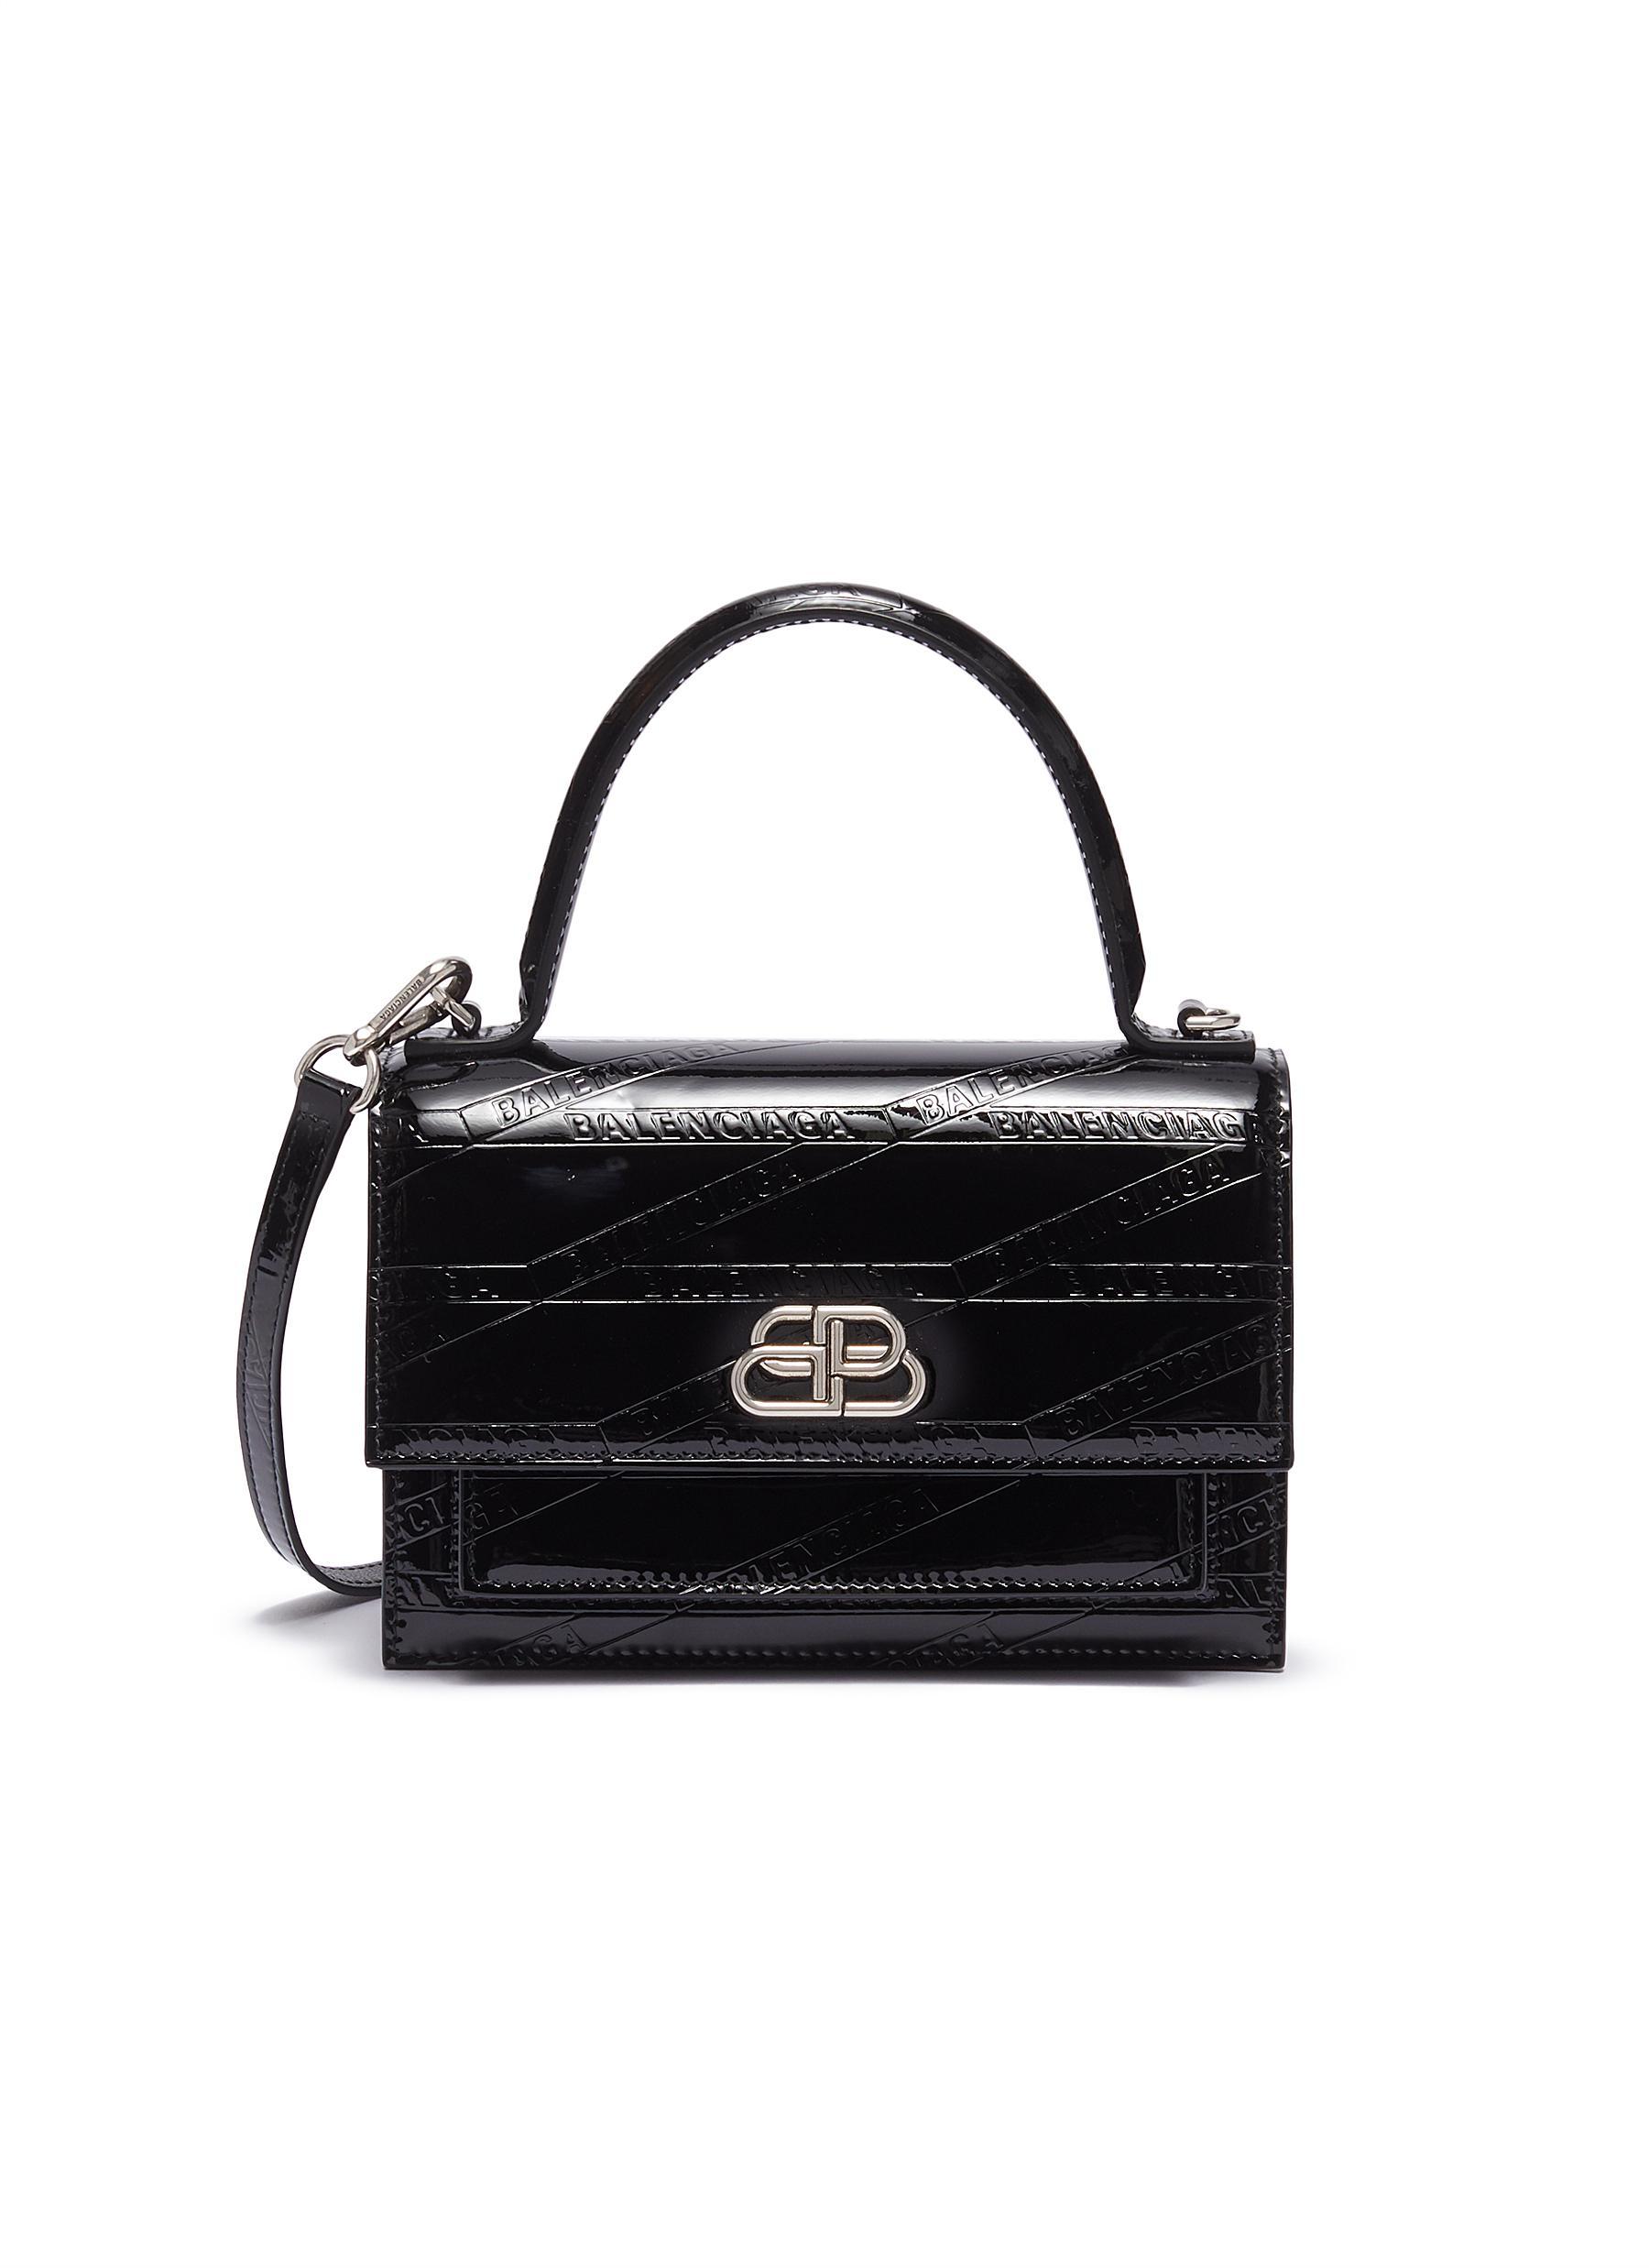 Balenciaga 'Sharp Xs' Logo Embossed Patent Leather Shoulder Bag In Black Logo Embossed